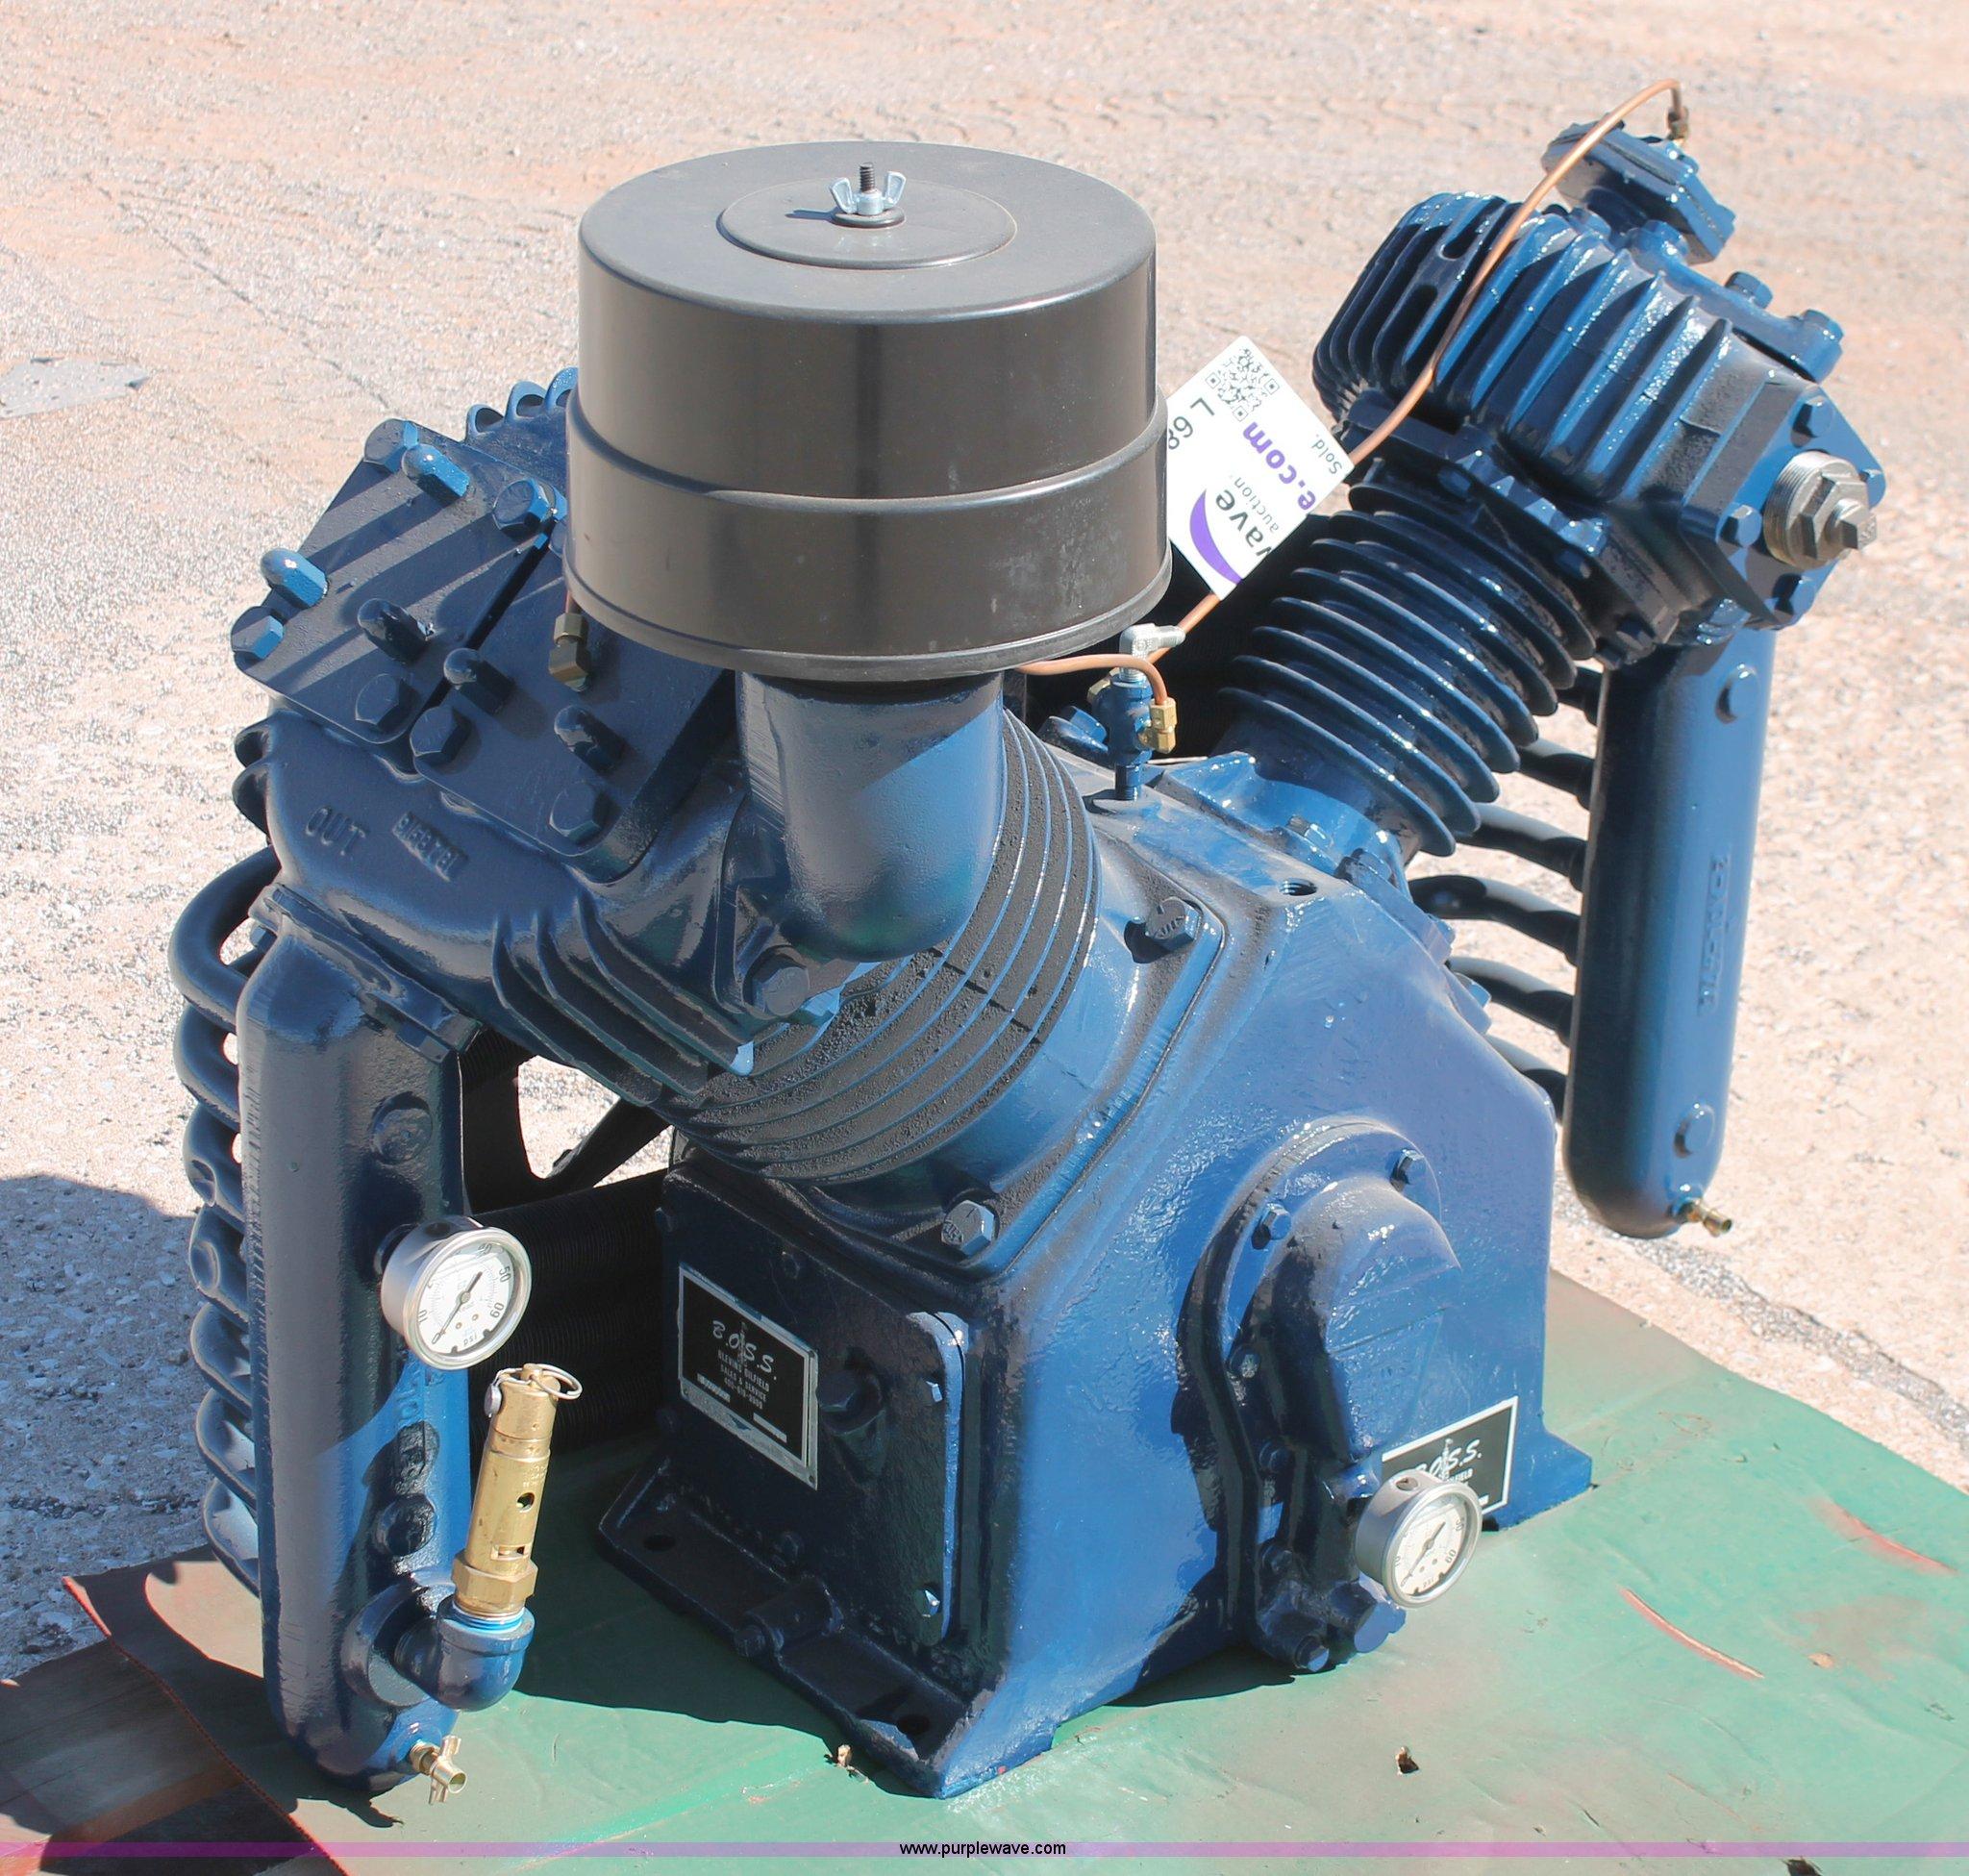 Gardner Denver Adl 1003 Air Compressor Item L6847 Sold Motor Wiring Diagrams Full Size In New Window